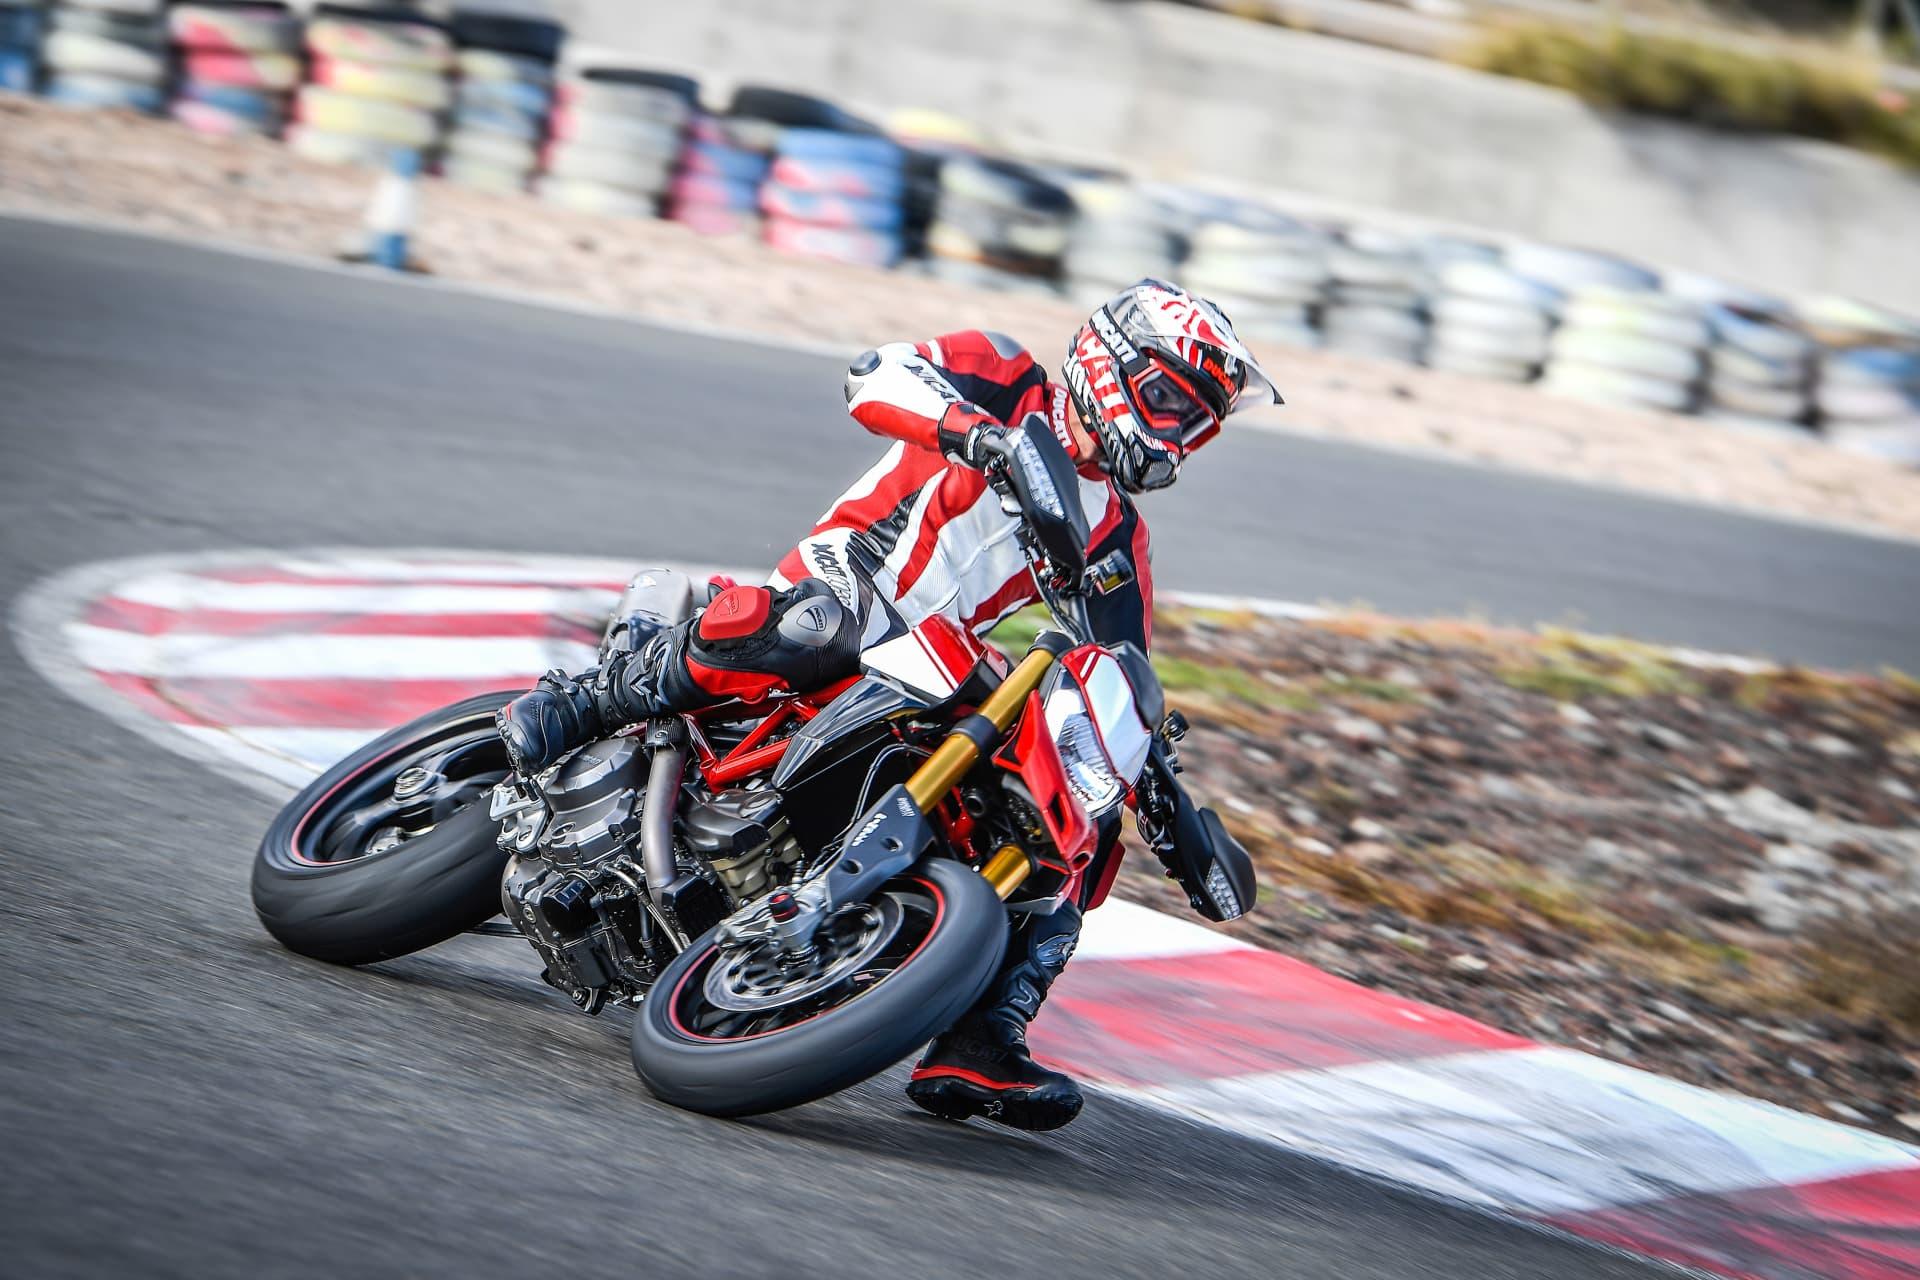 Ducati Hypermotard 950 Sp Performance 02 Uc70333 Mid